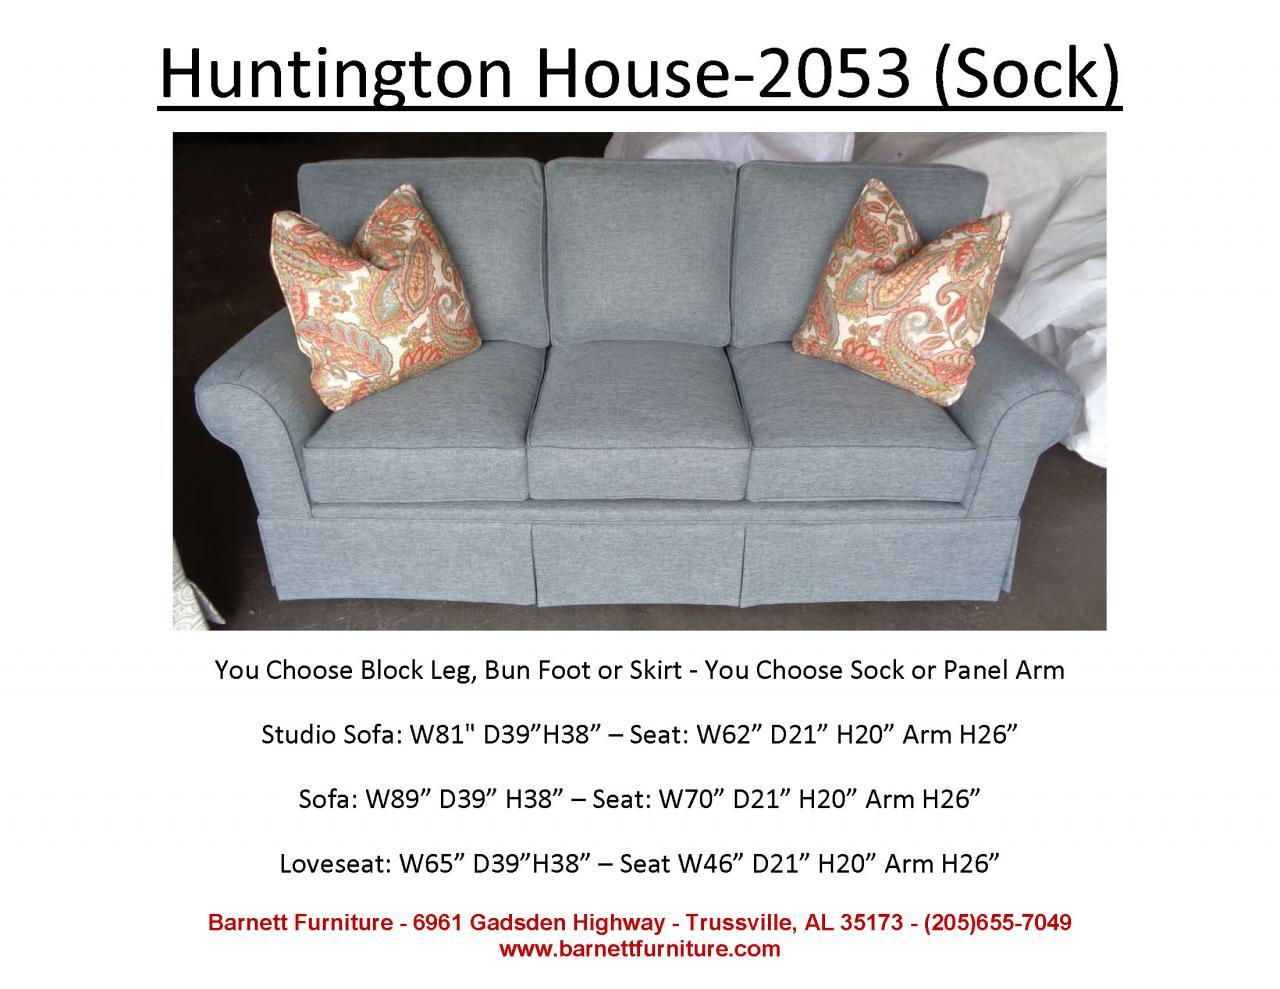 ... Huntington House 2053 With Sock Arm And Skirt ...